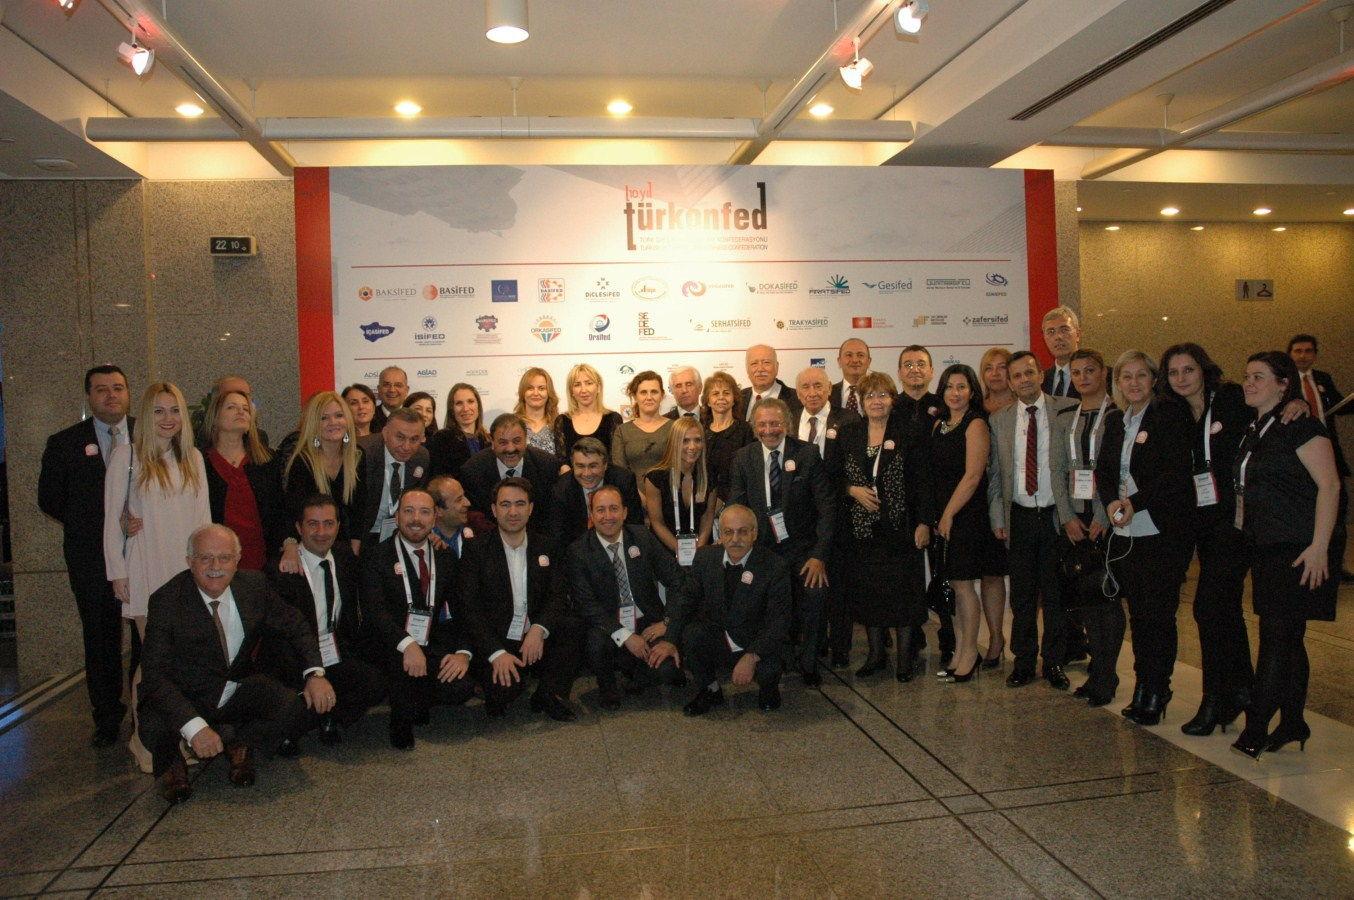 TURKONFED 10. Yılını Kutladı